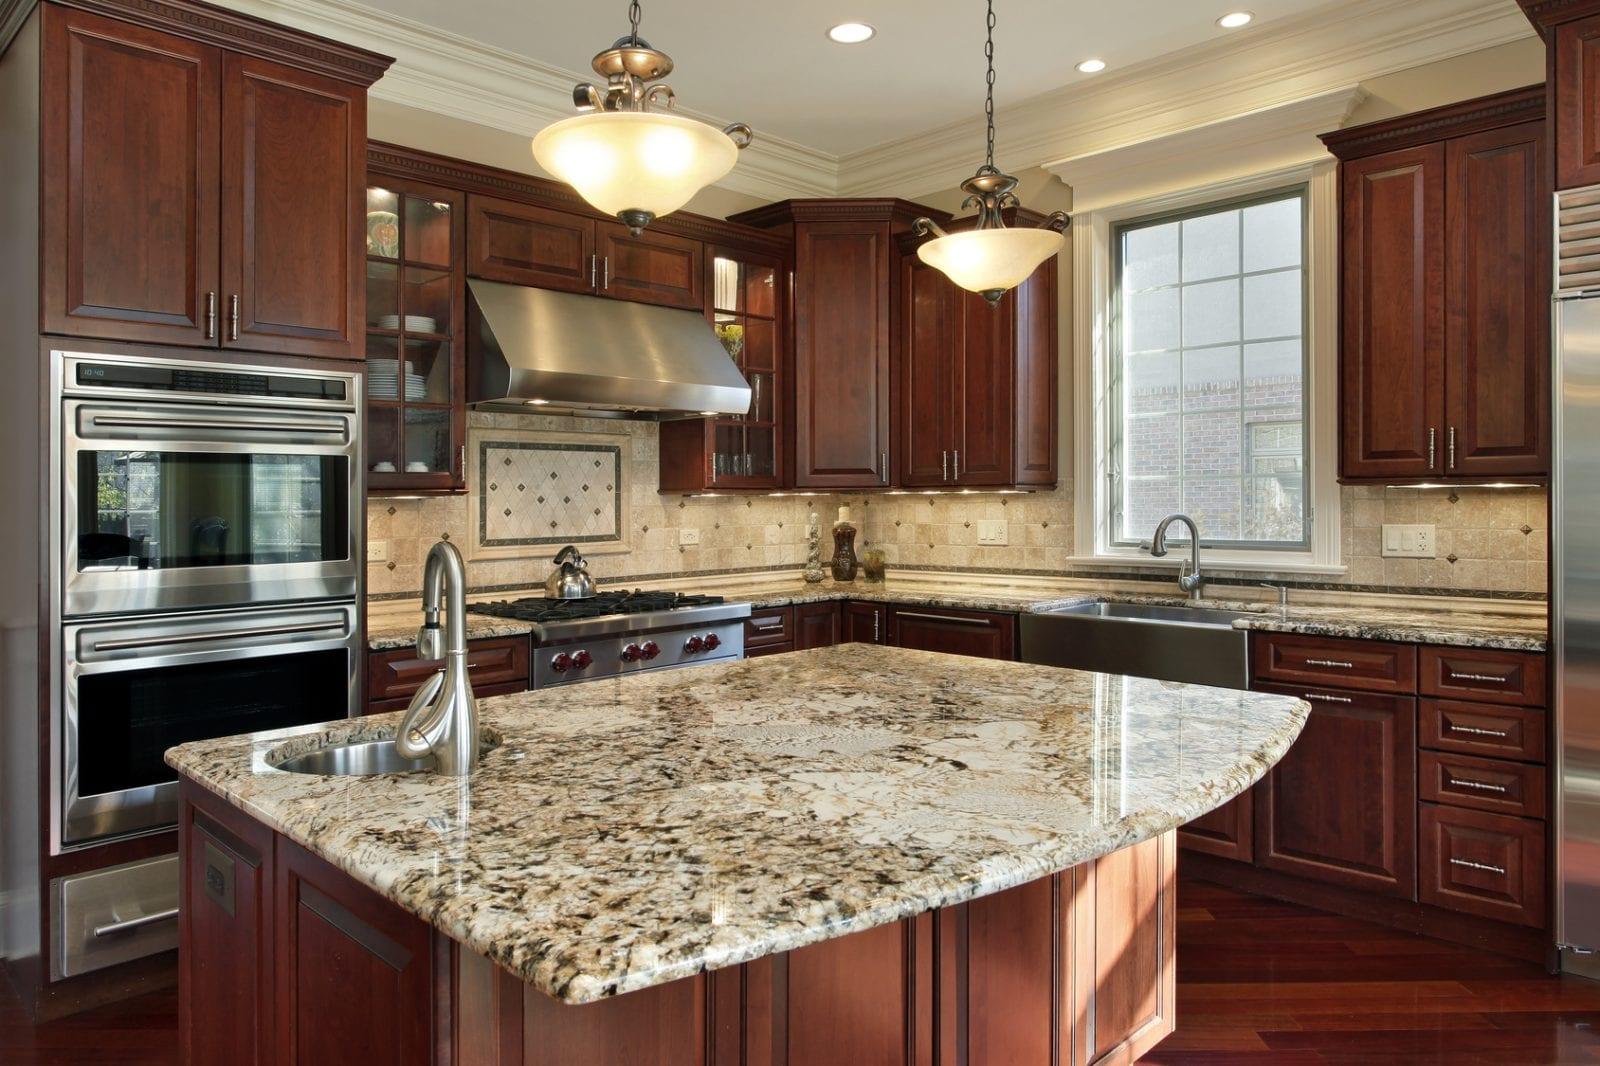 Home Kitchen And Bath Unlimited - Bathroom remodel kalamazoo